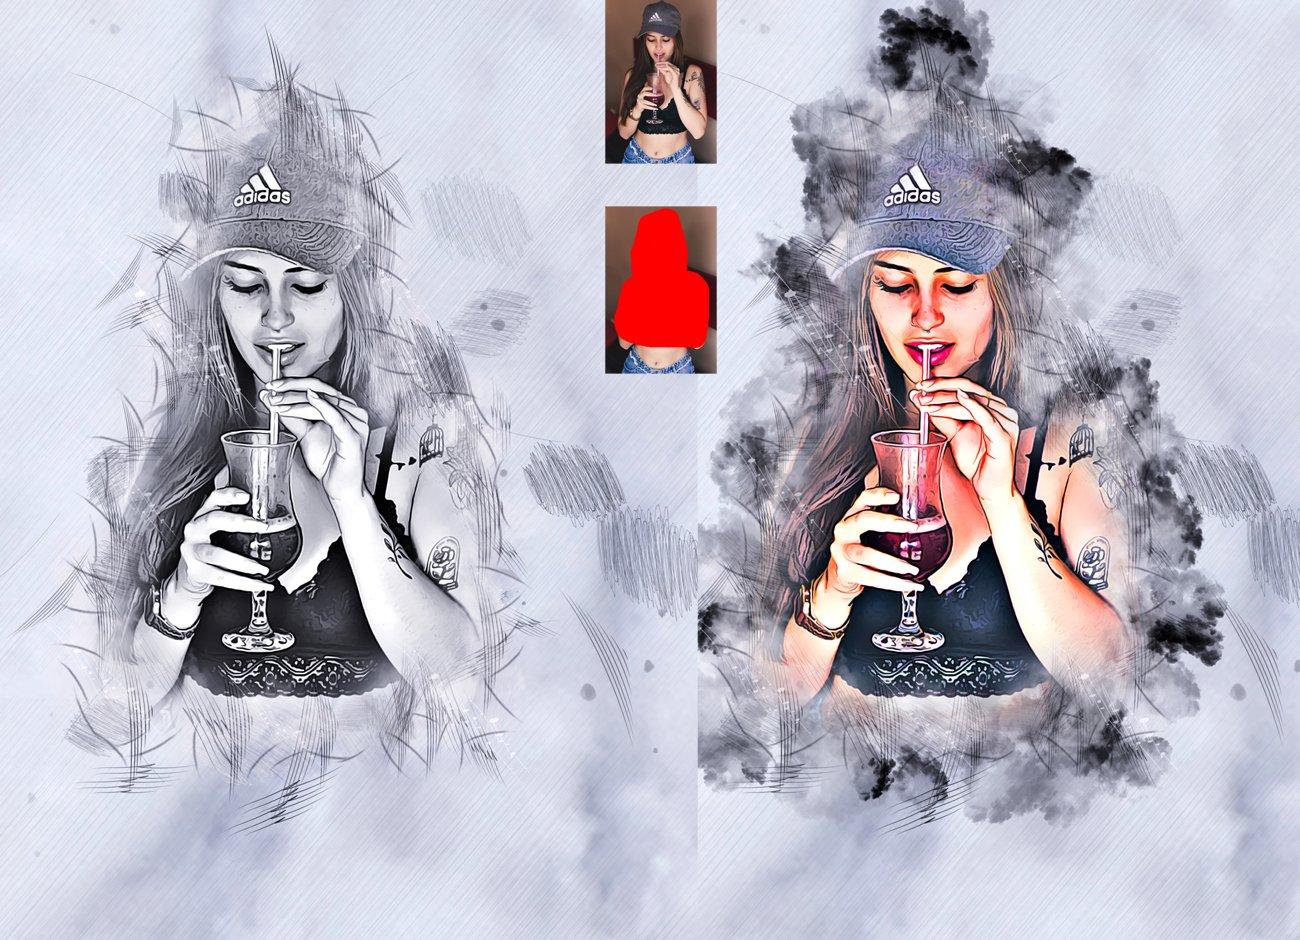 水墨素描效果照片处理特效PS动作模板 Ink Sketch Art Photoshop Action插图2